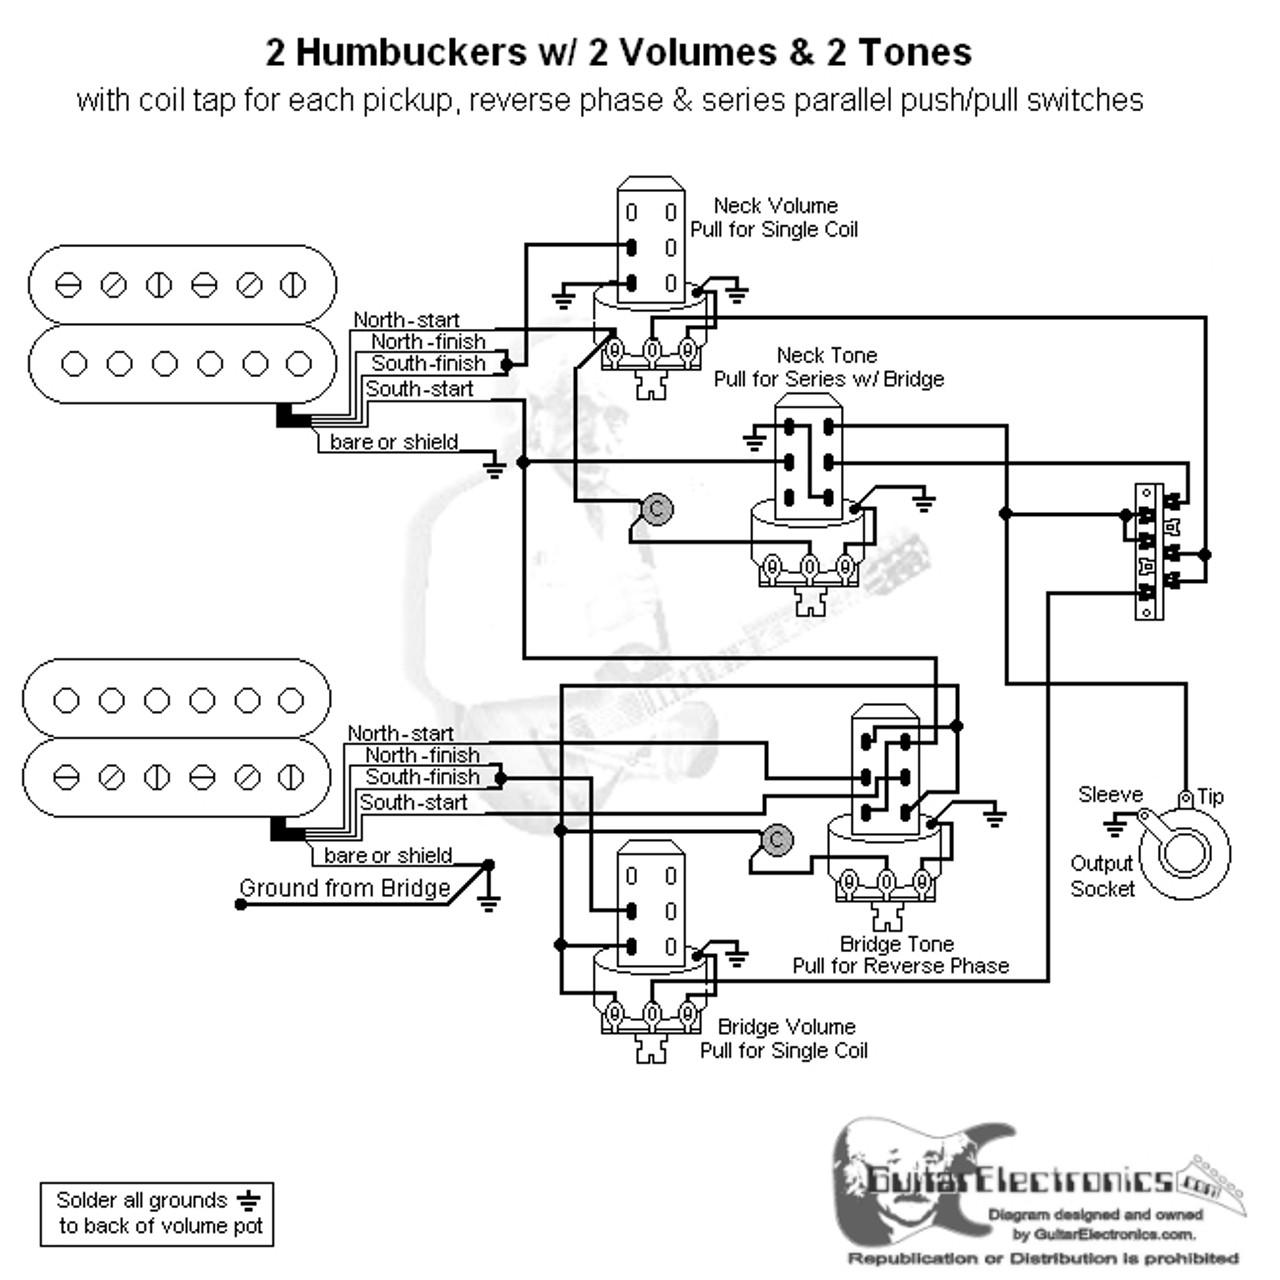 2 hbs 3 way lever 1 vol 2 tones coil tap \u0026 series parallel \u0026 phase